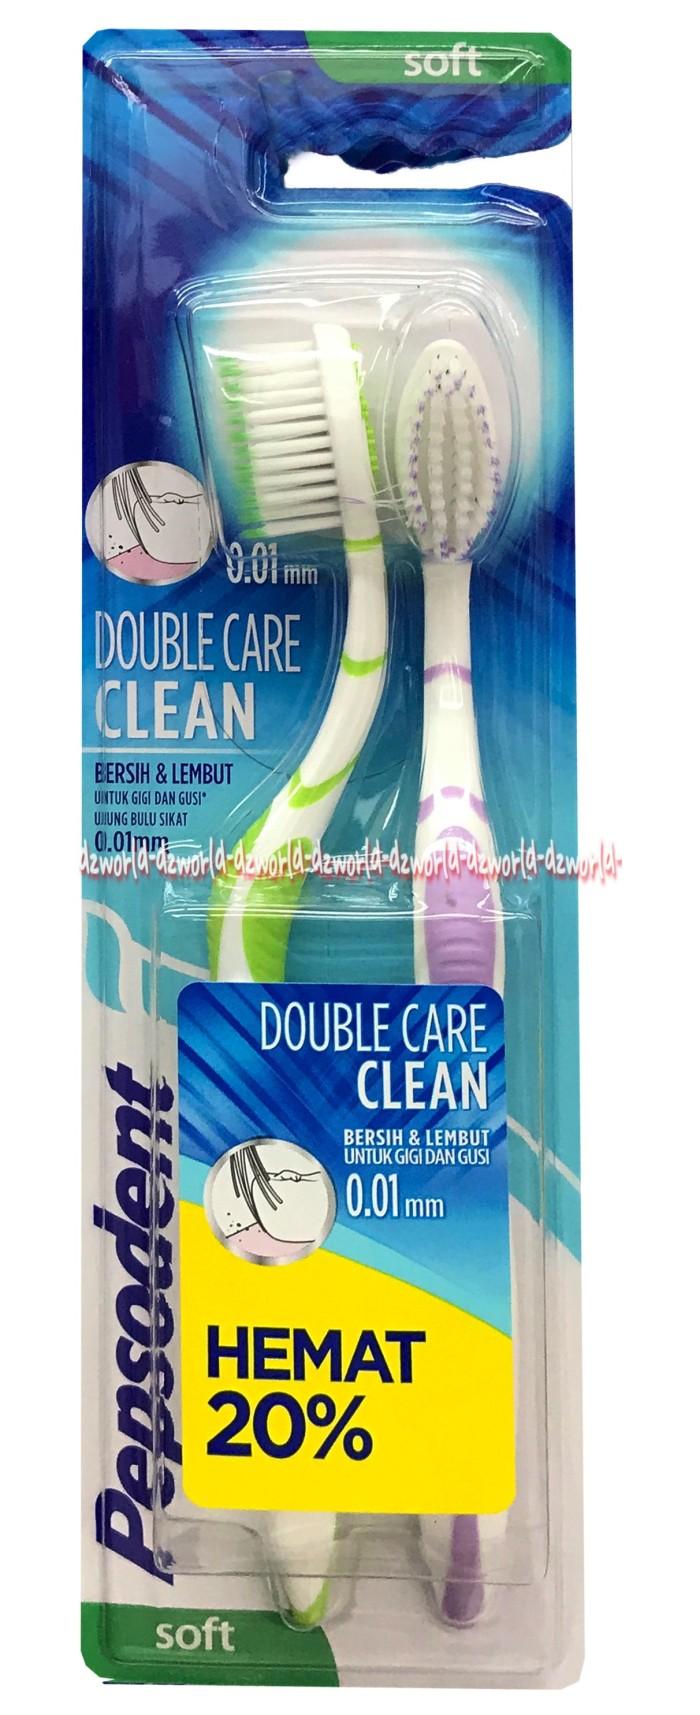 Pepsodent Double Care Clean Sikat Gigi Merawat Gigi   Gusi Sensitive 2 6e161f1824